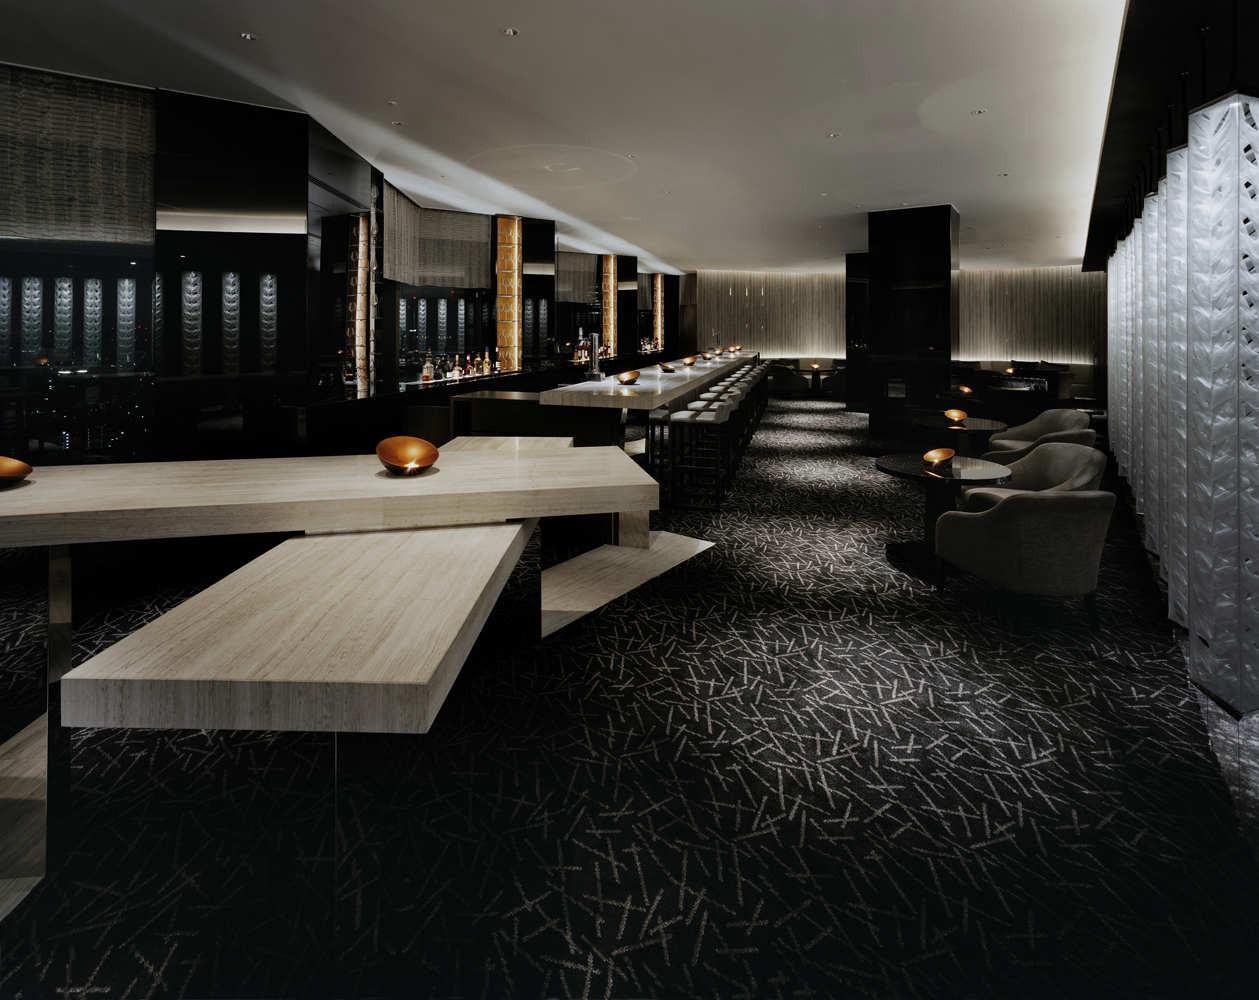 Gallery of MIXX Bar & Lounge / Curiosity - 2